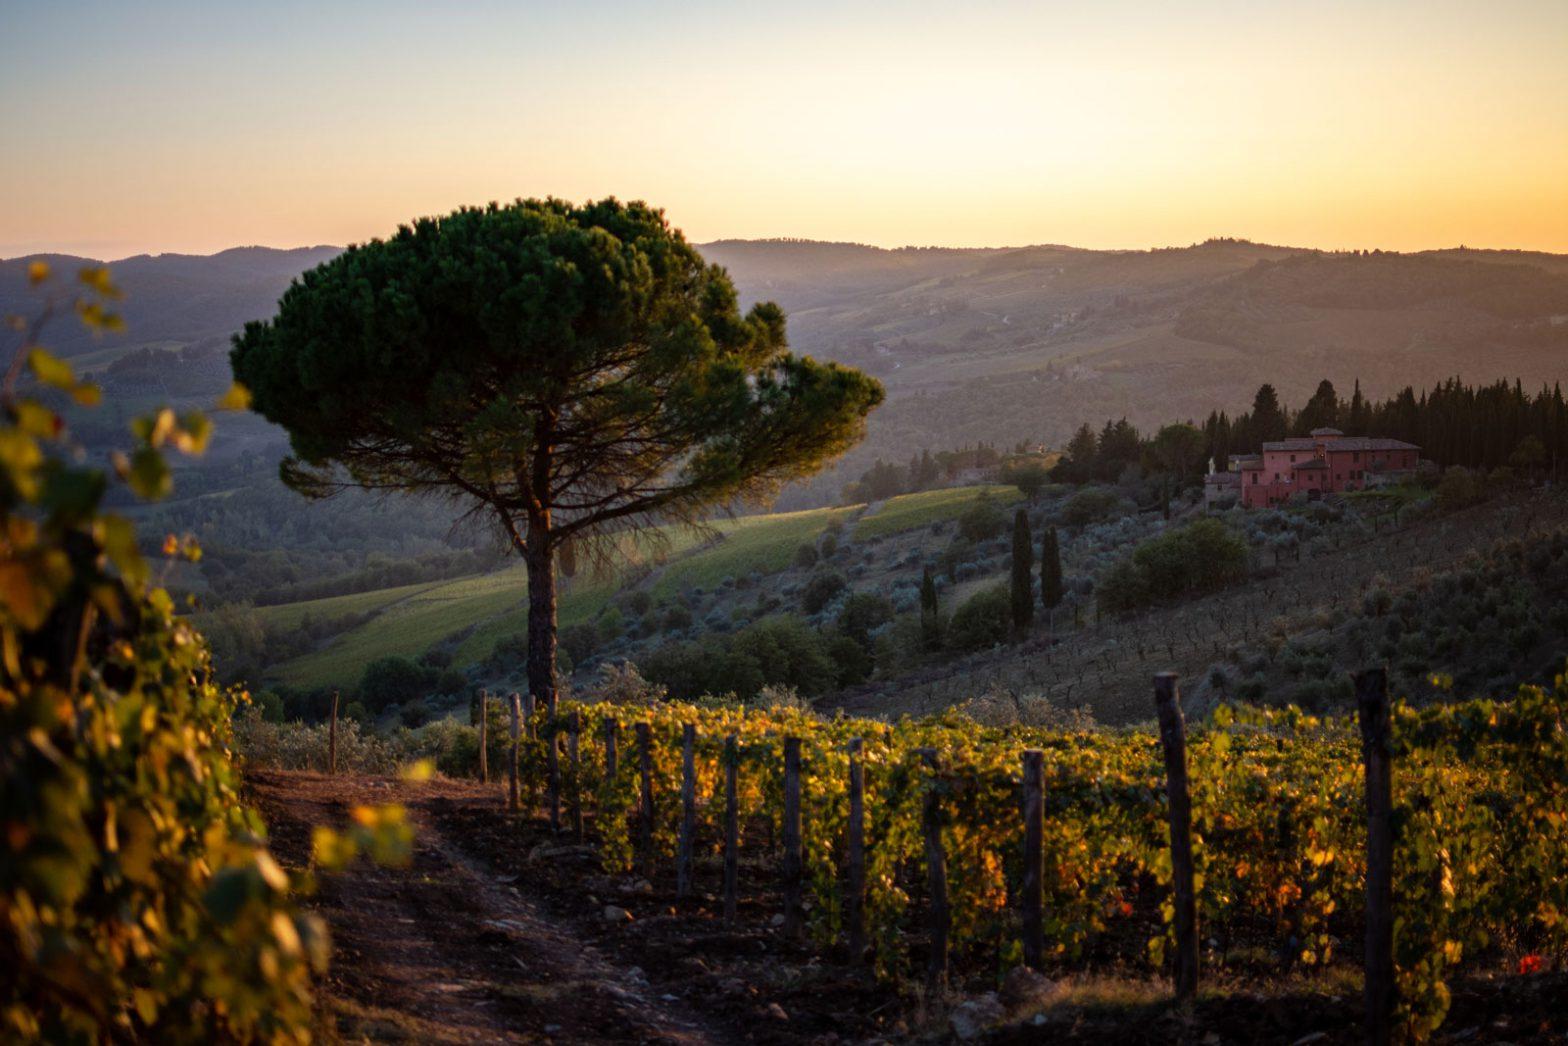 Bildresultat för Il Palagio di Panzano winery